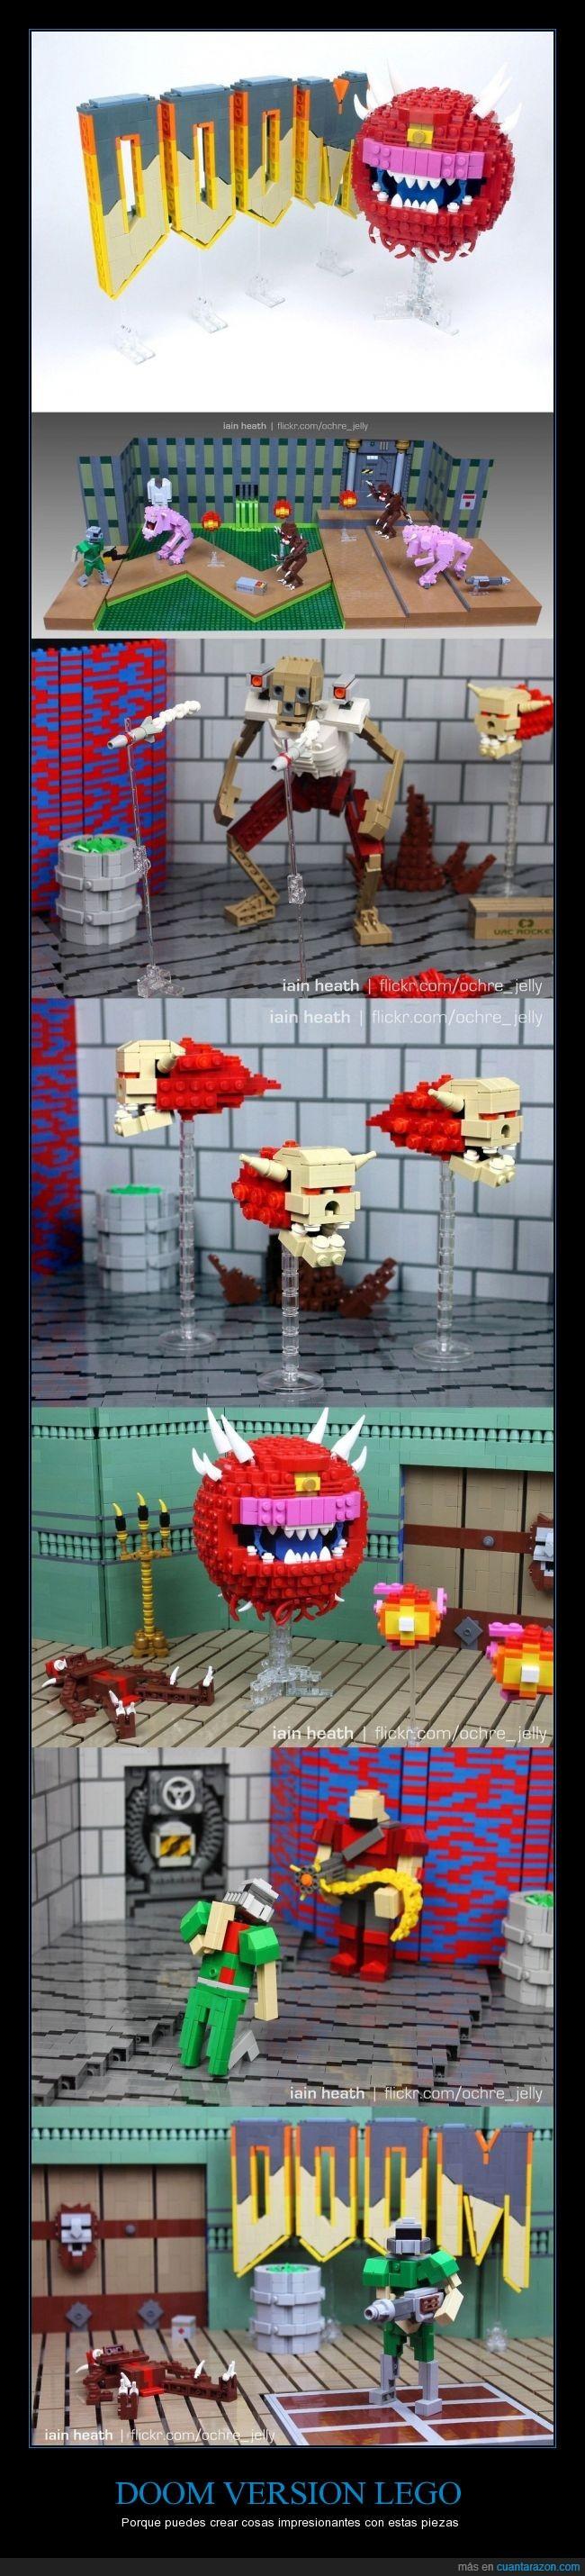 doom,Lego,pieza,videojuego